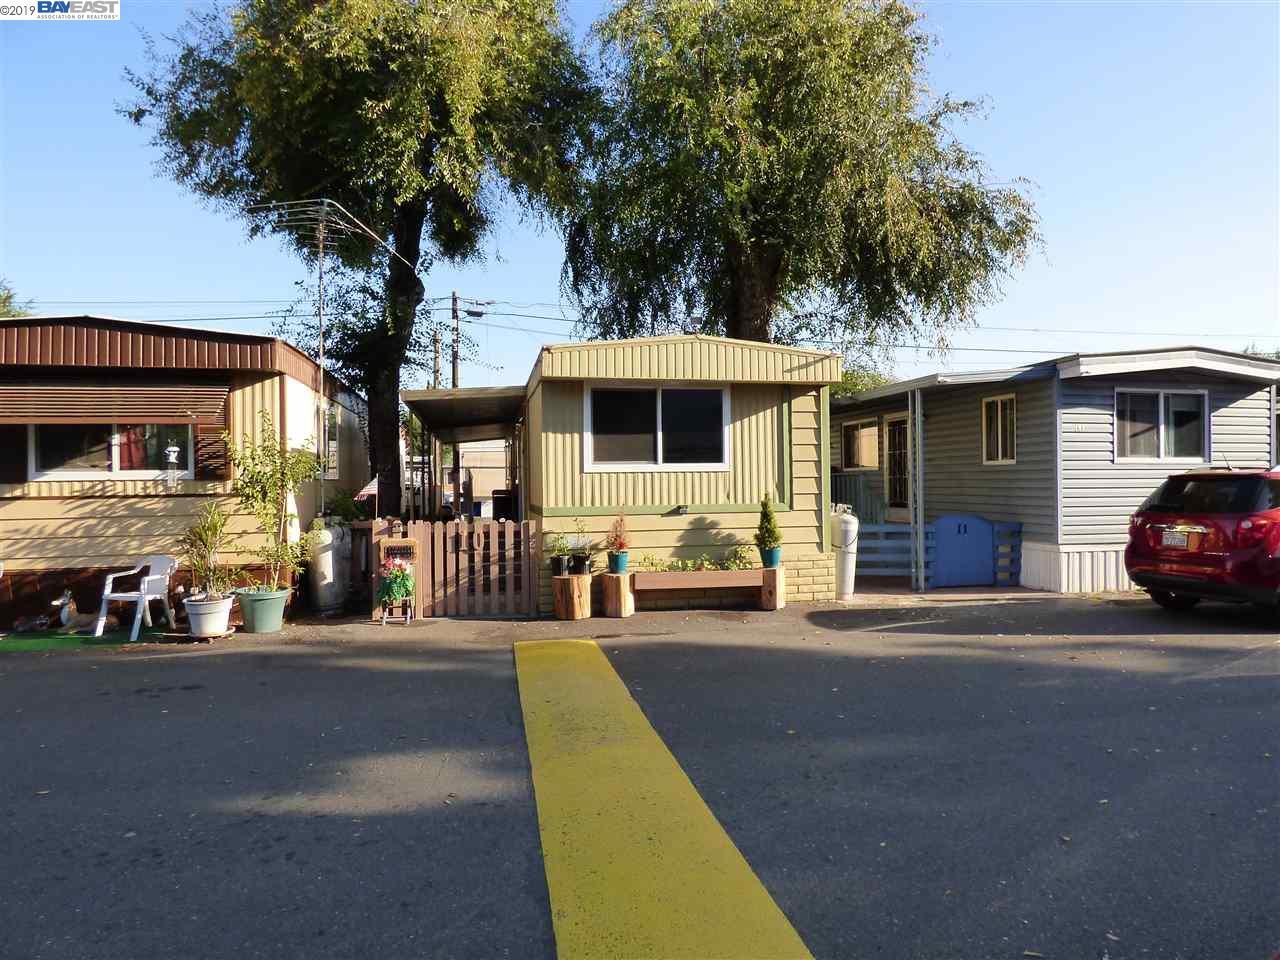 2399 E 14th San Leandro Ca 94577 1 Beds 1 Baths